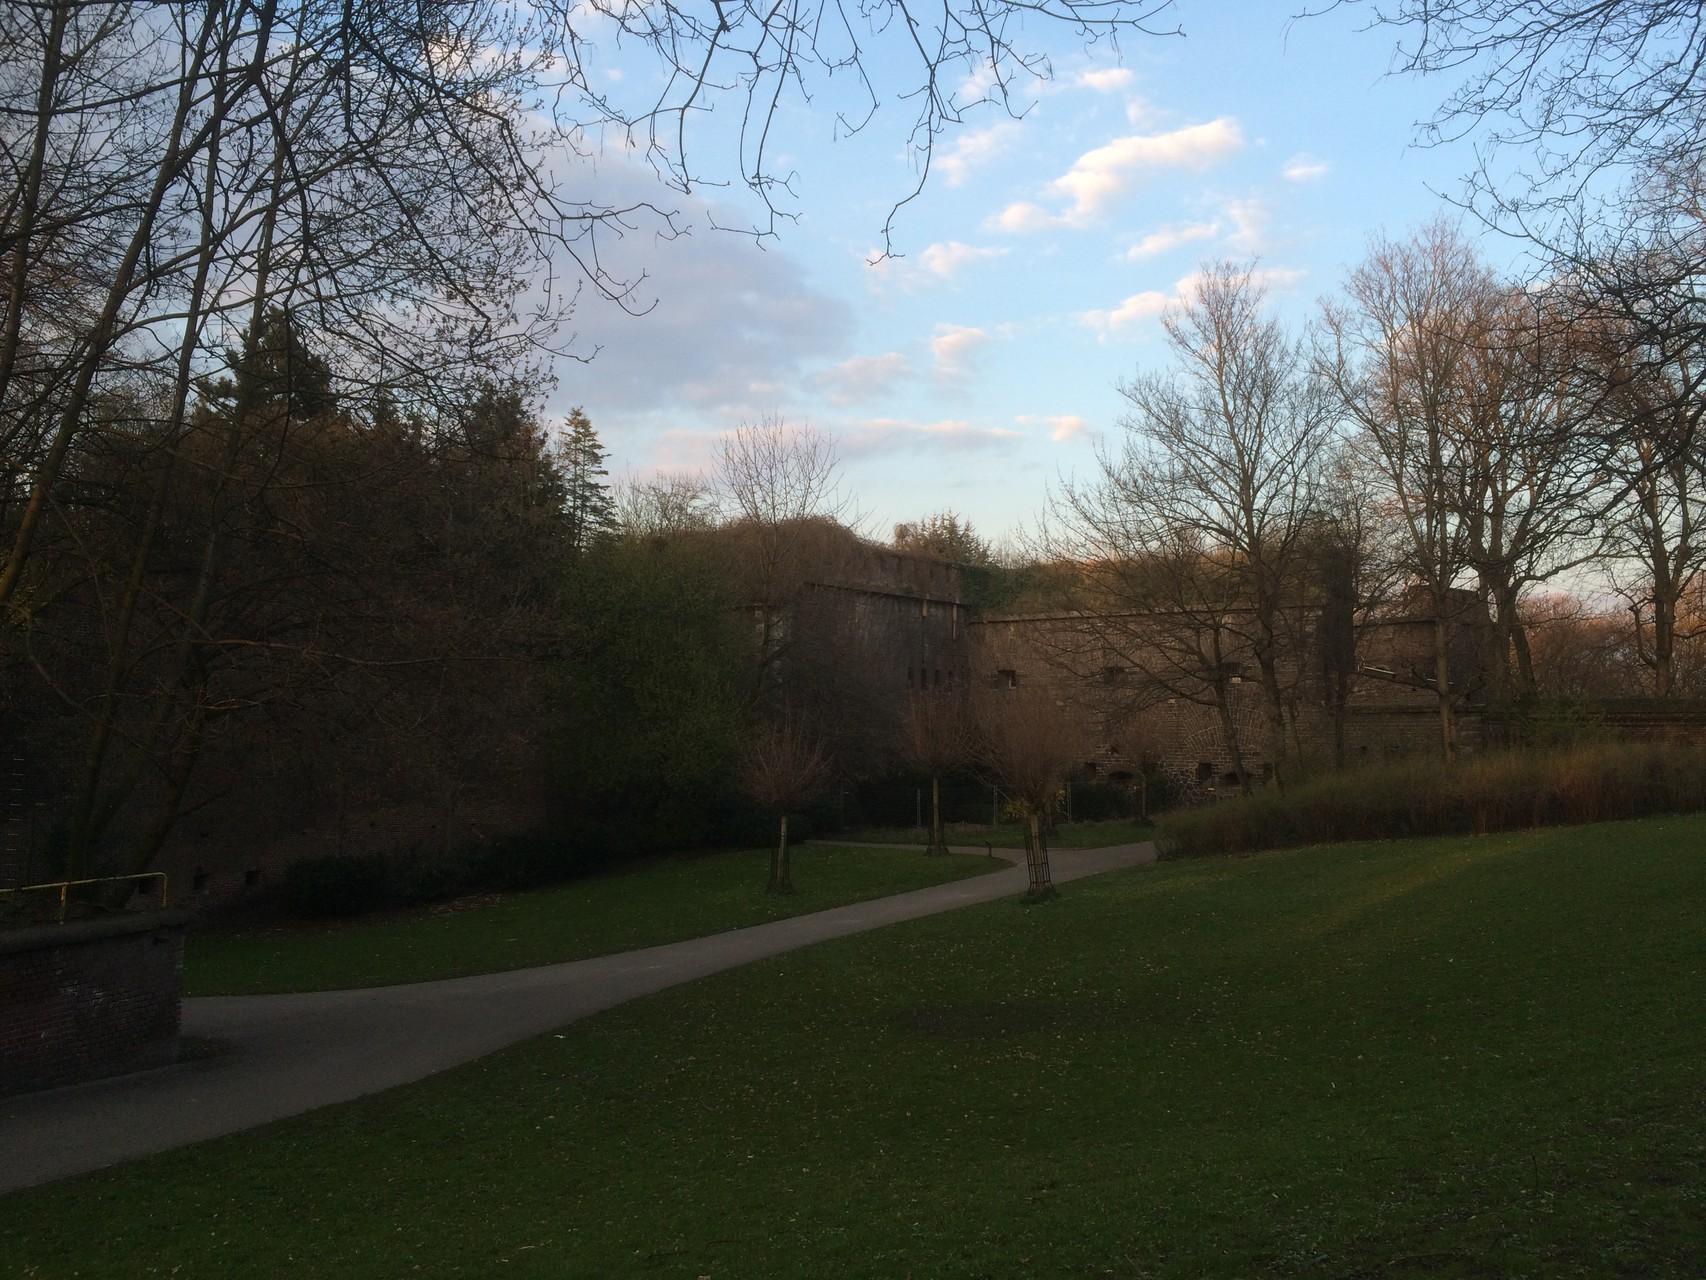 Permanenter Wanderweg durch Köln/Ostersonntag 05.04.2015  (Fotograf: K.Kra.)